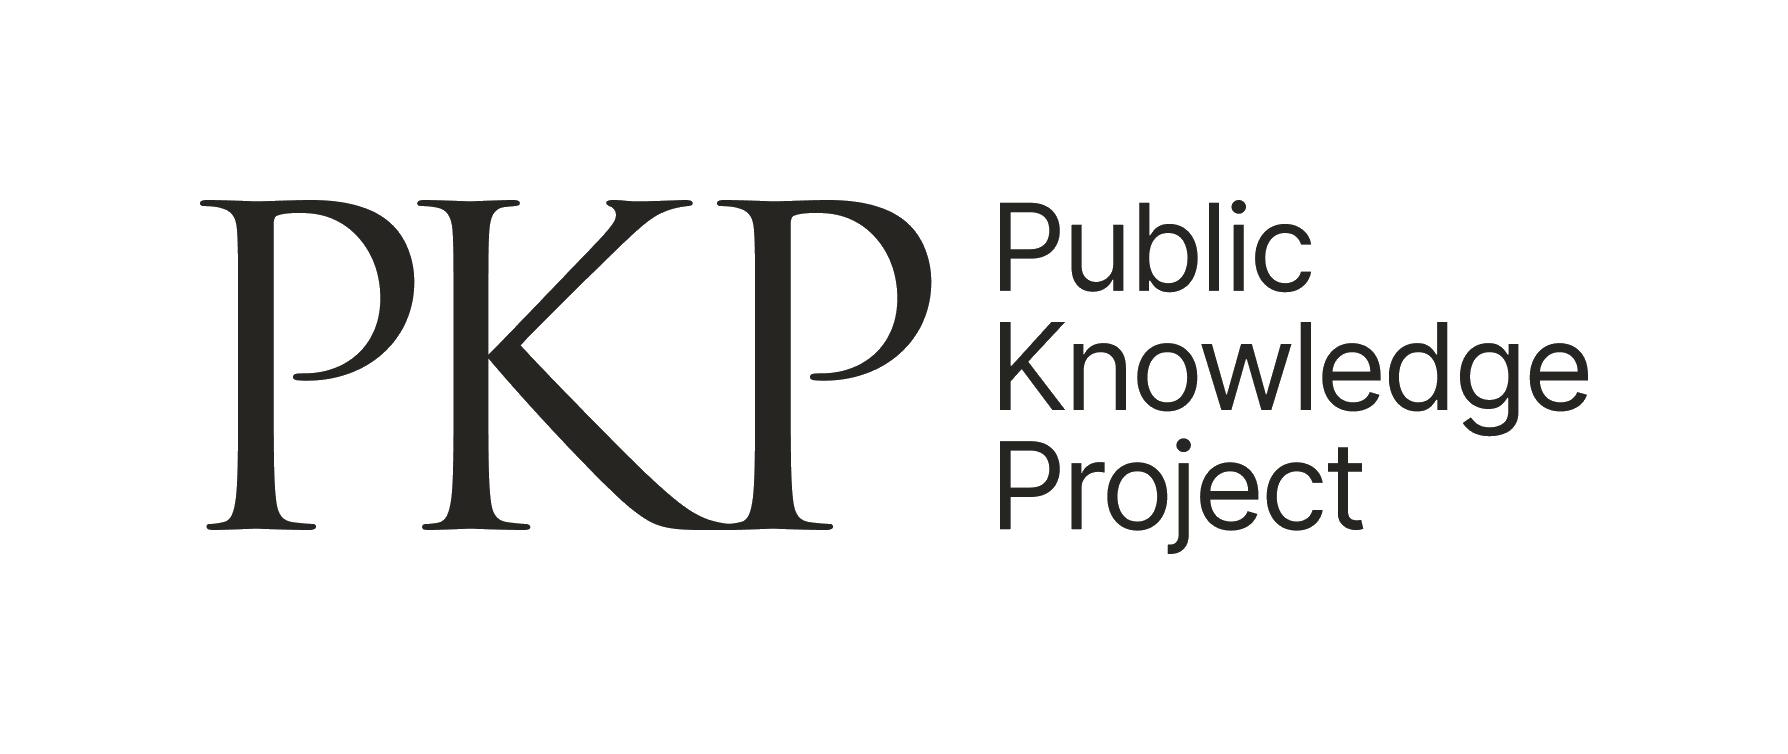 Public Knowledge Project logo